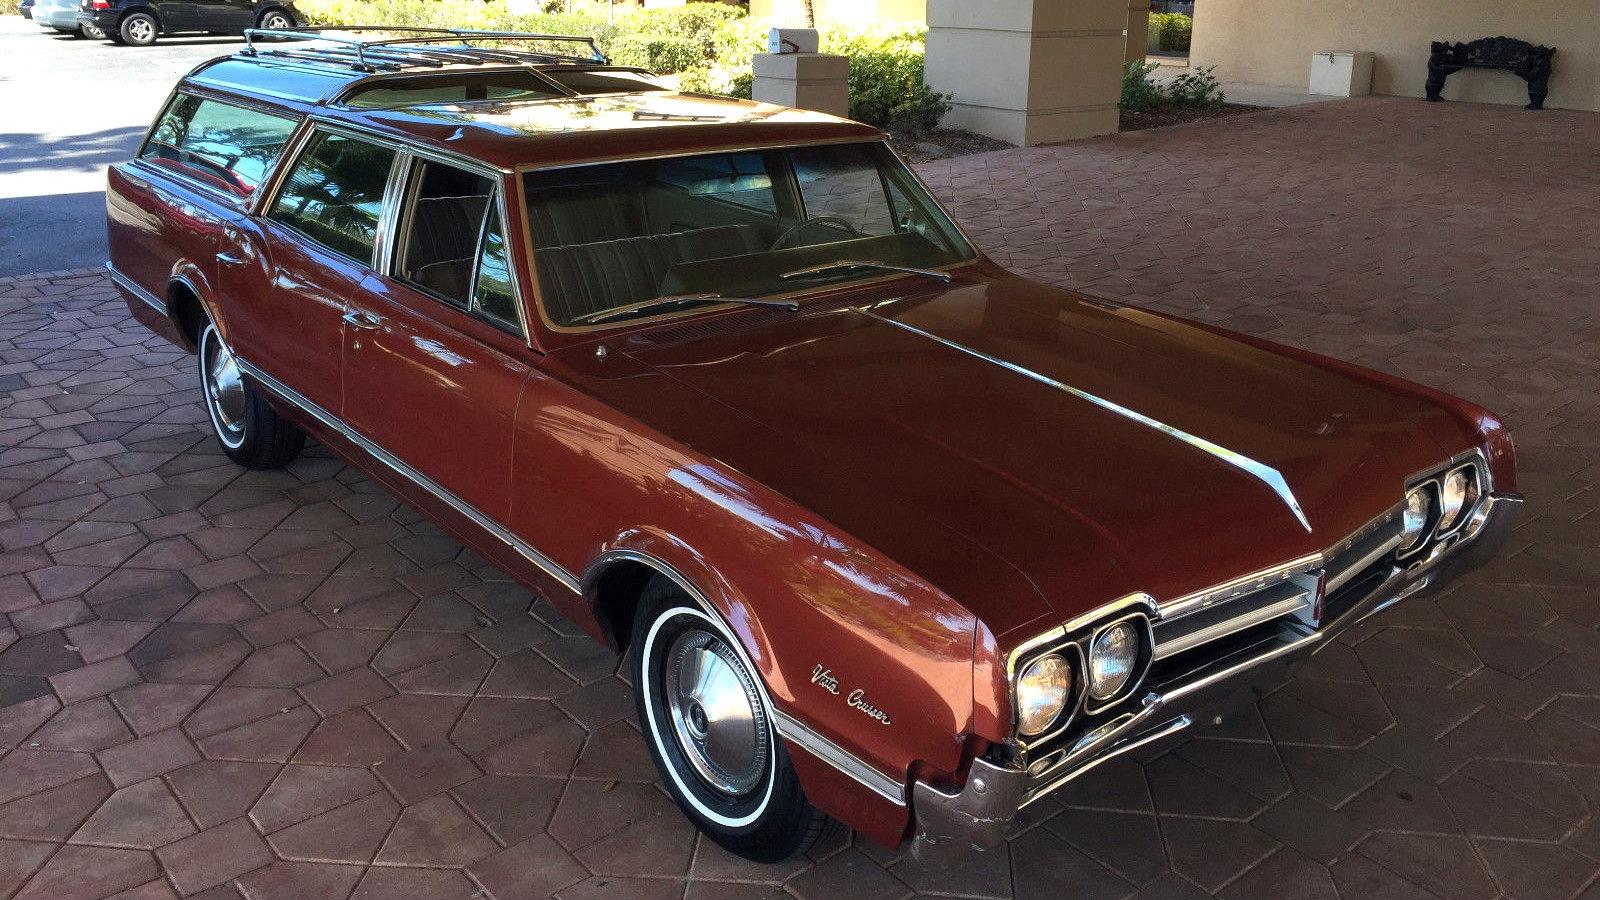 12k In Miles >> Best Original 1966 Olds Vista Cruiser Left?